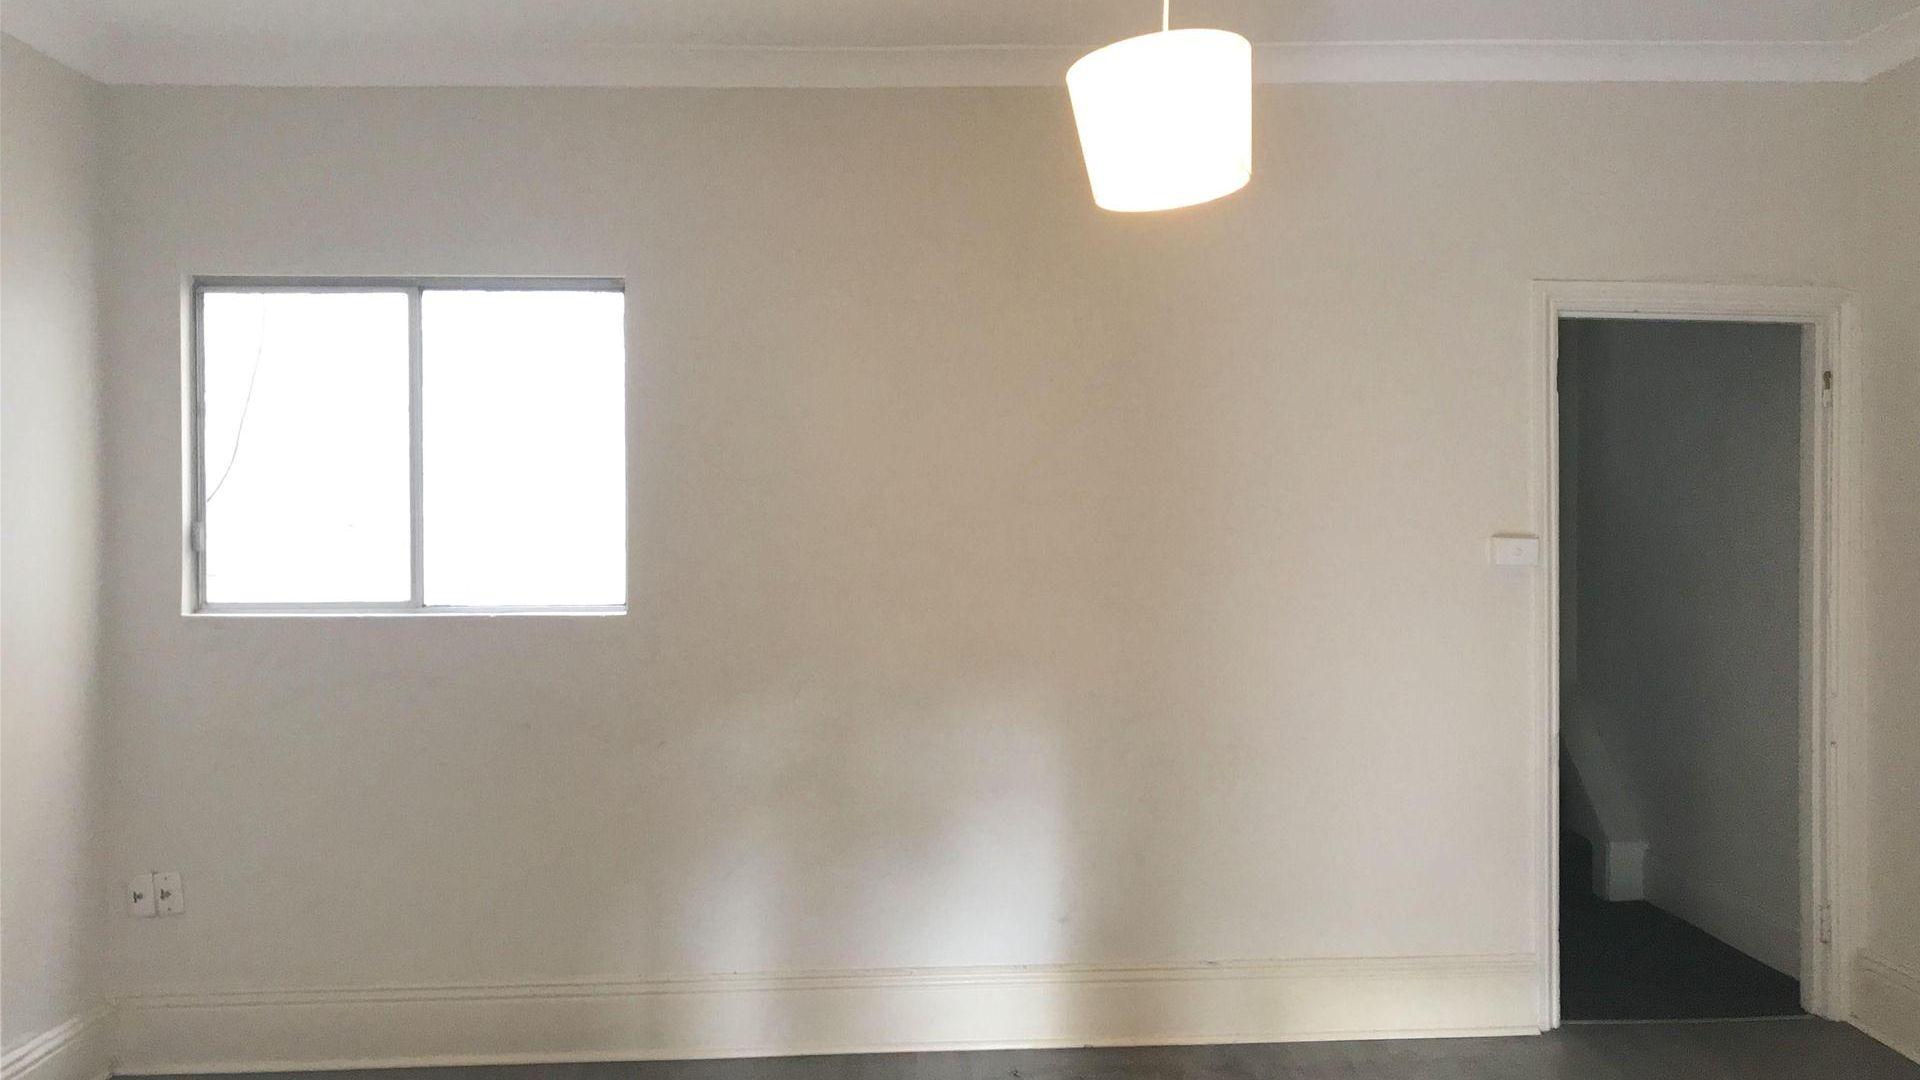 1/39 Parramatta Road, Annandale NSW 2038, Image 1